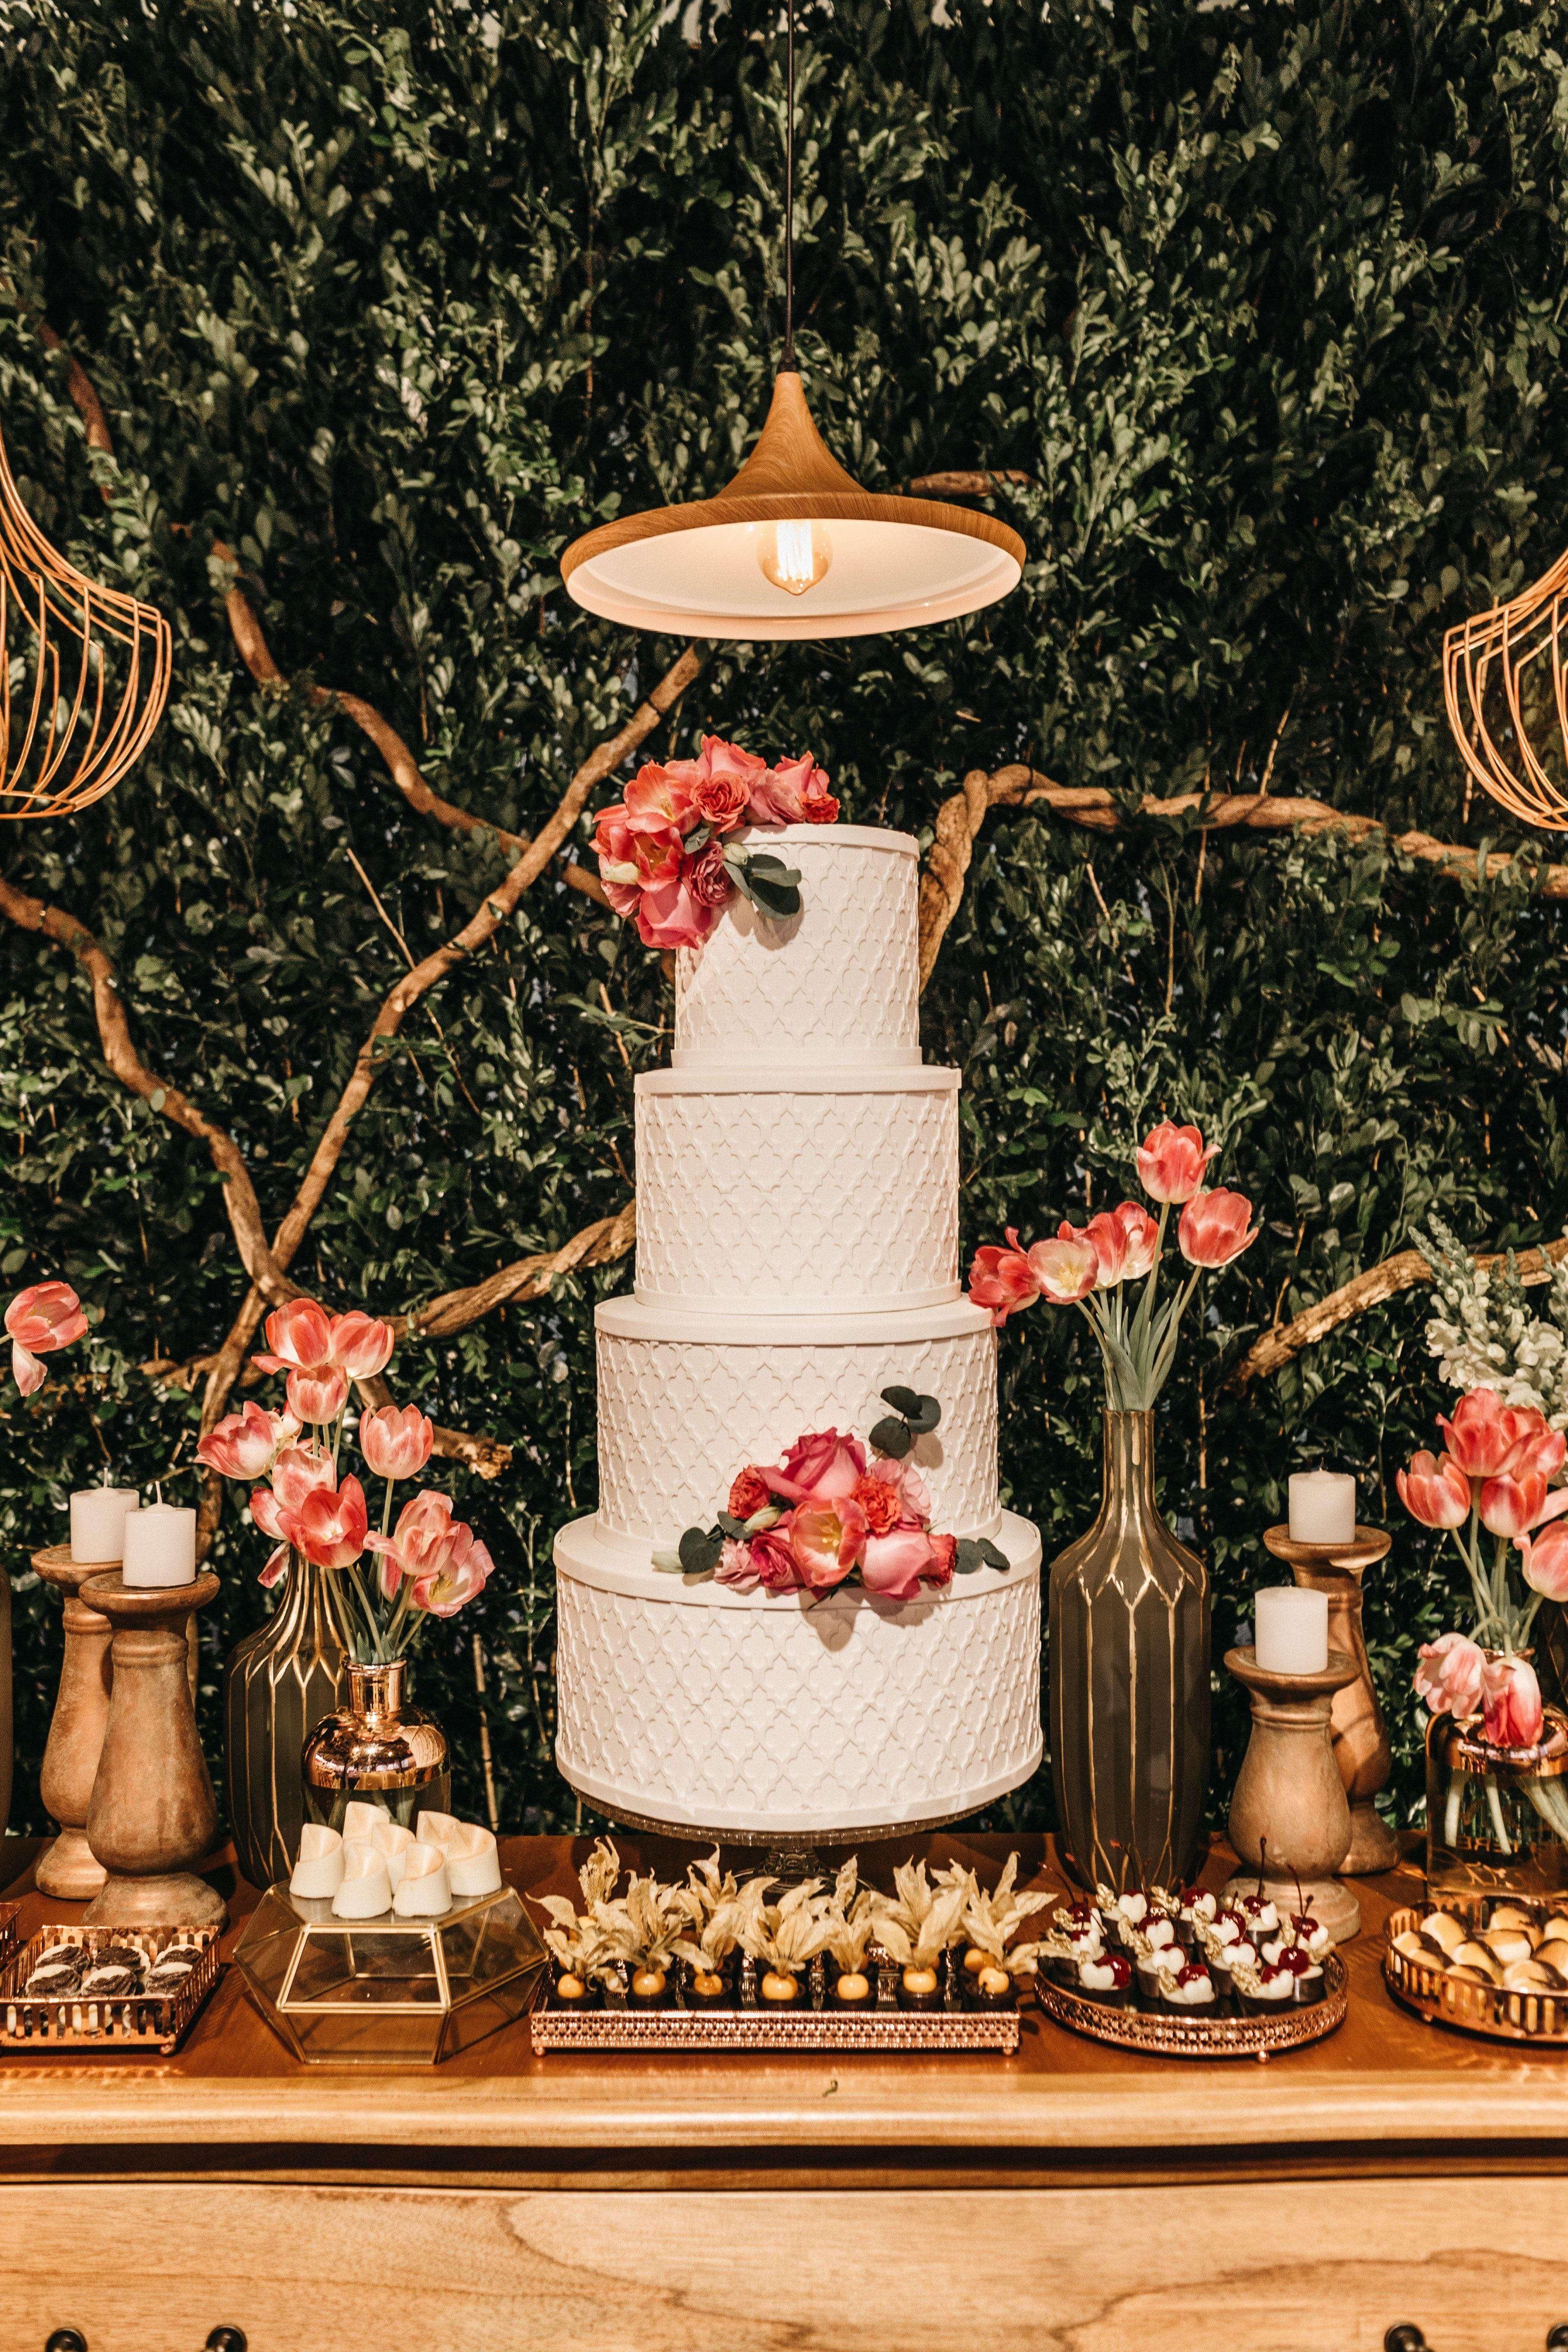 White four tier wedding cake on a dessert table